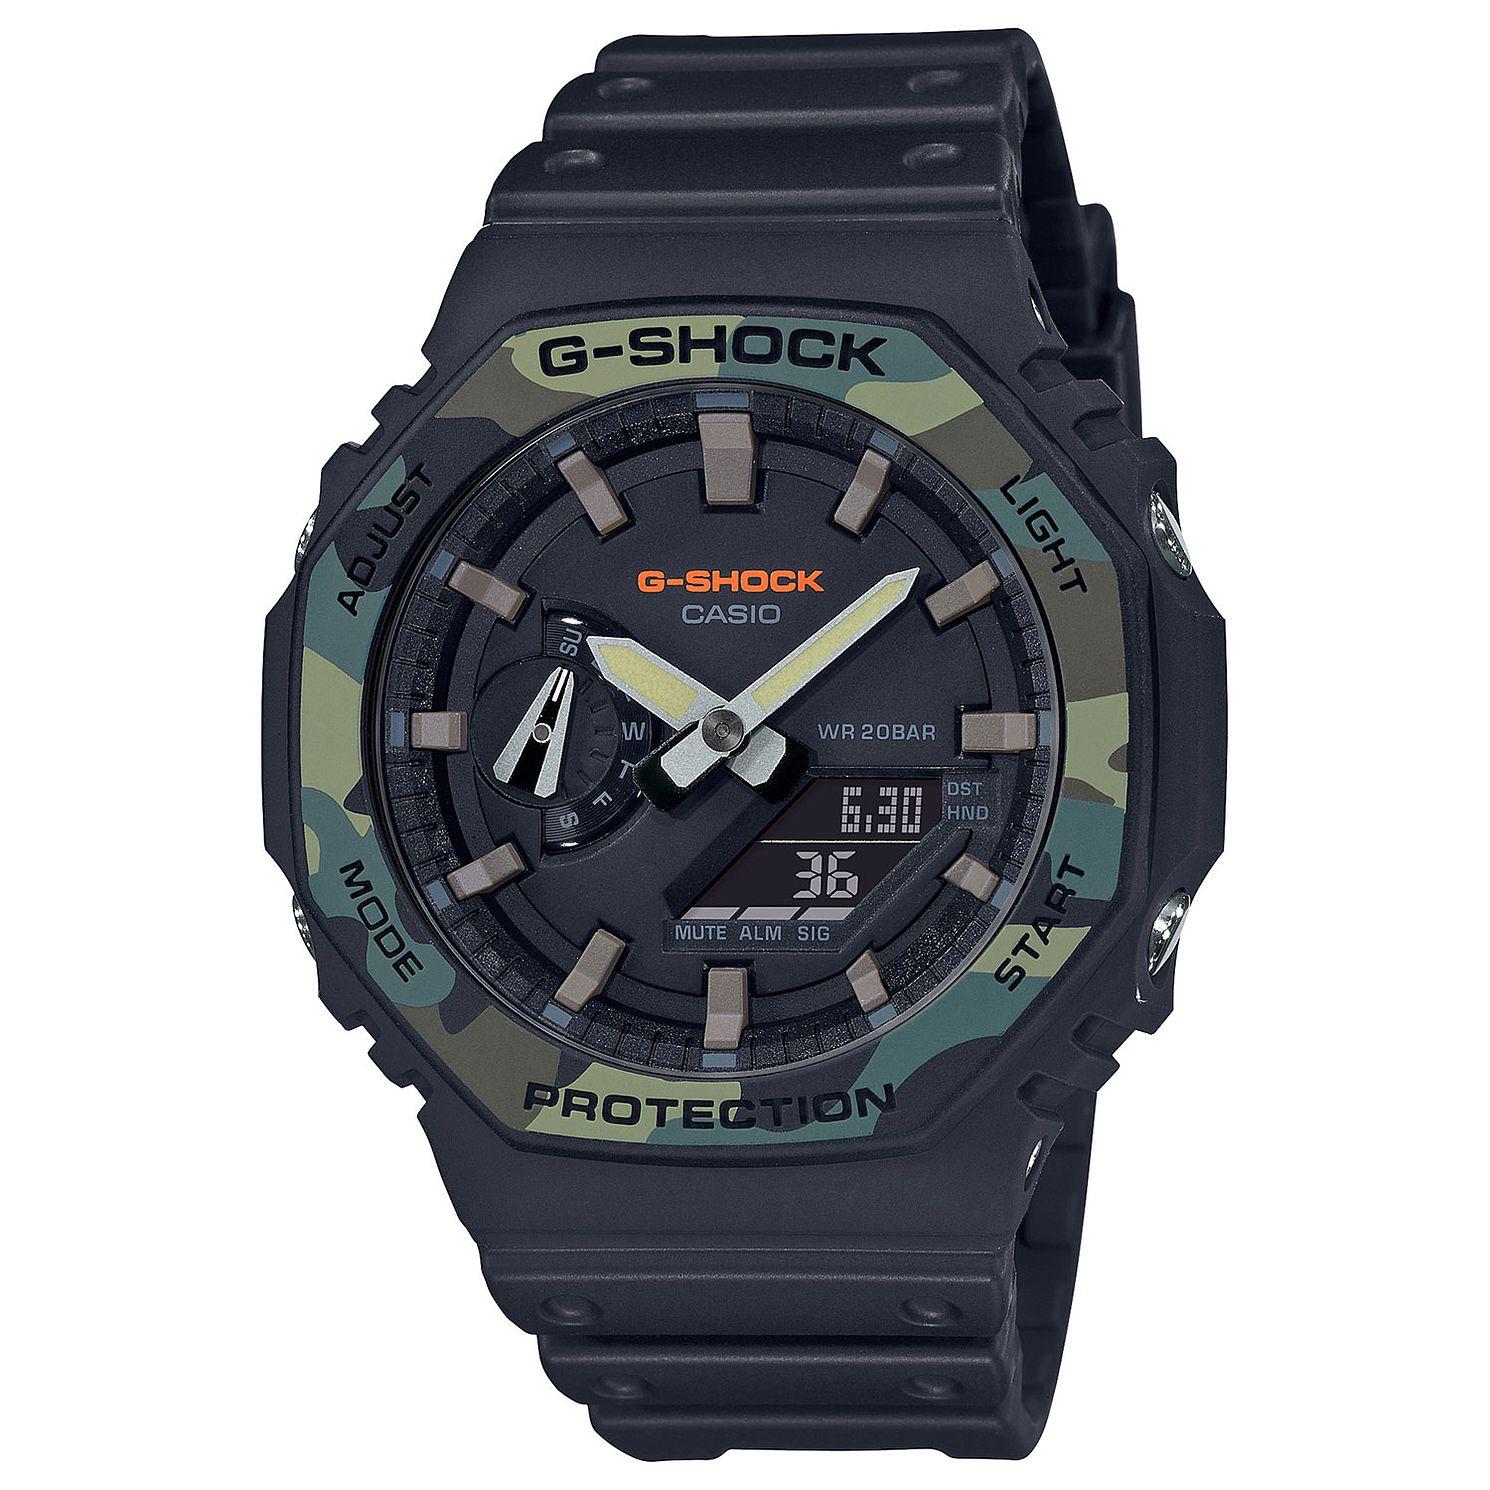 G Shock GA-2100SU-1AER Watch - £98.10 @ H Samuel (With 10% Off Newsletter Sign Up)